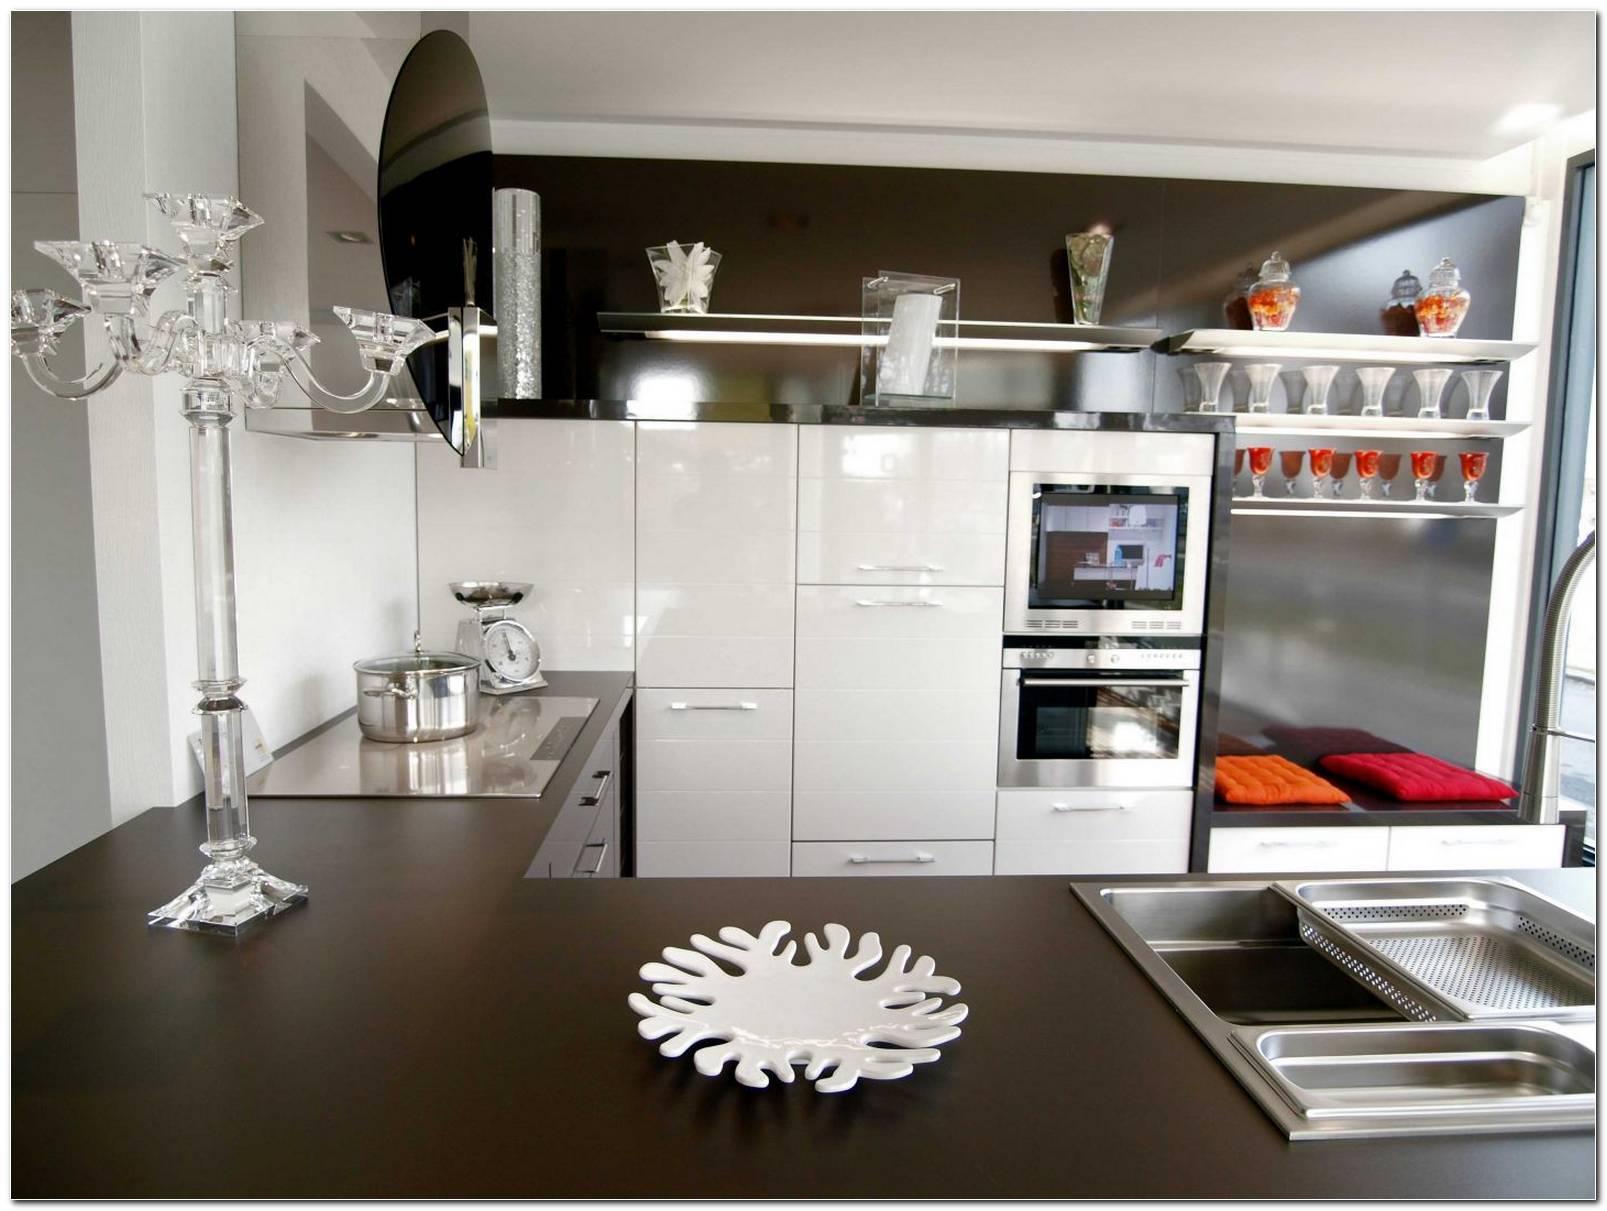 Acess%C3%B3rio De Decora%C3%A7%C3%A3o Para Cozinha